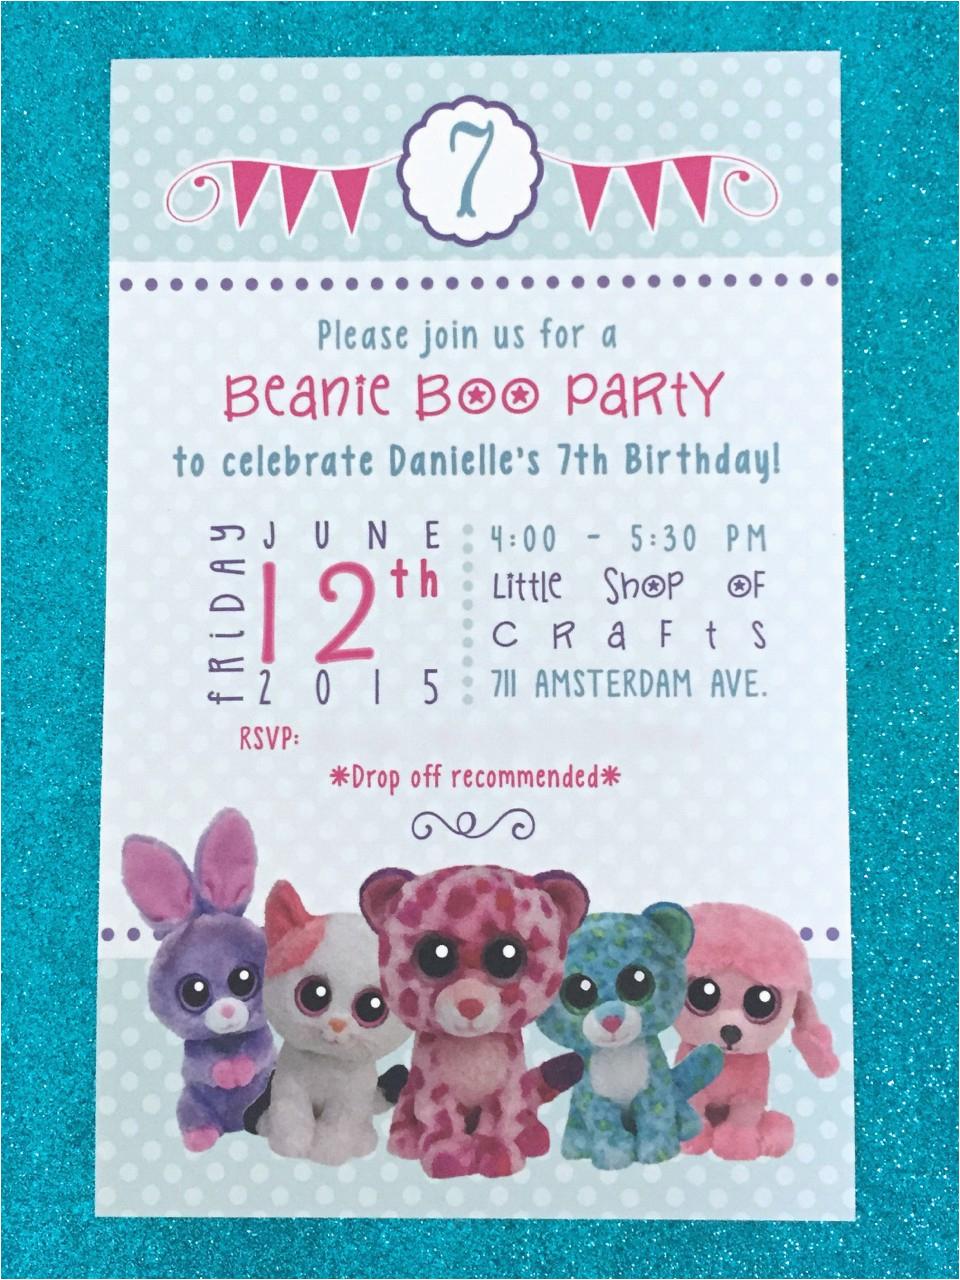 Beanie Boo Birthday Invitations Beanie Boo Bonanza B Lee events